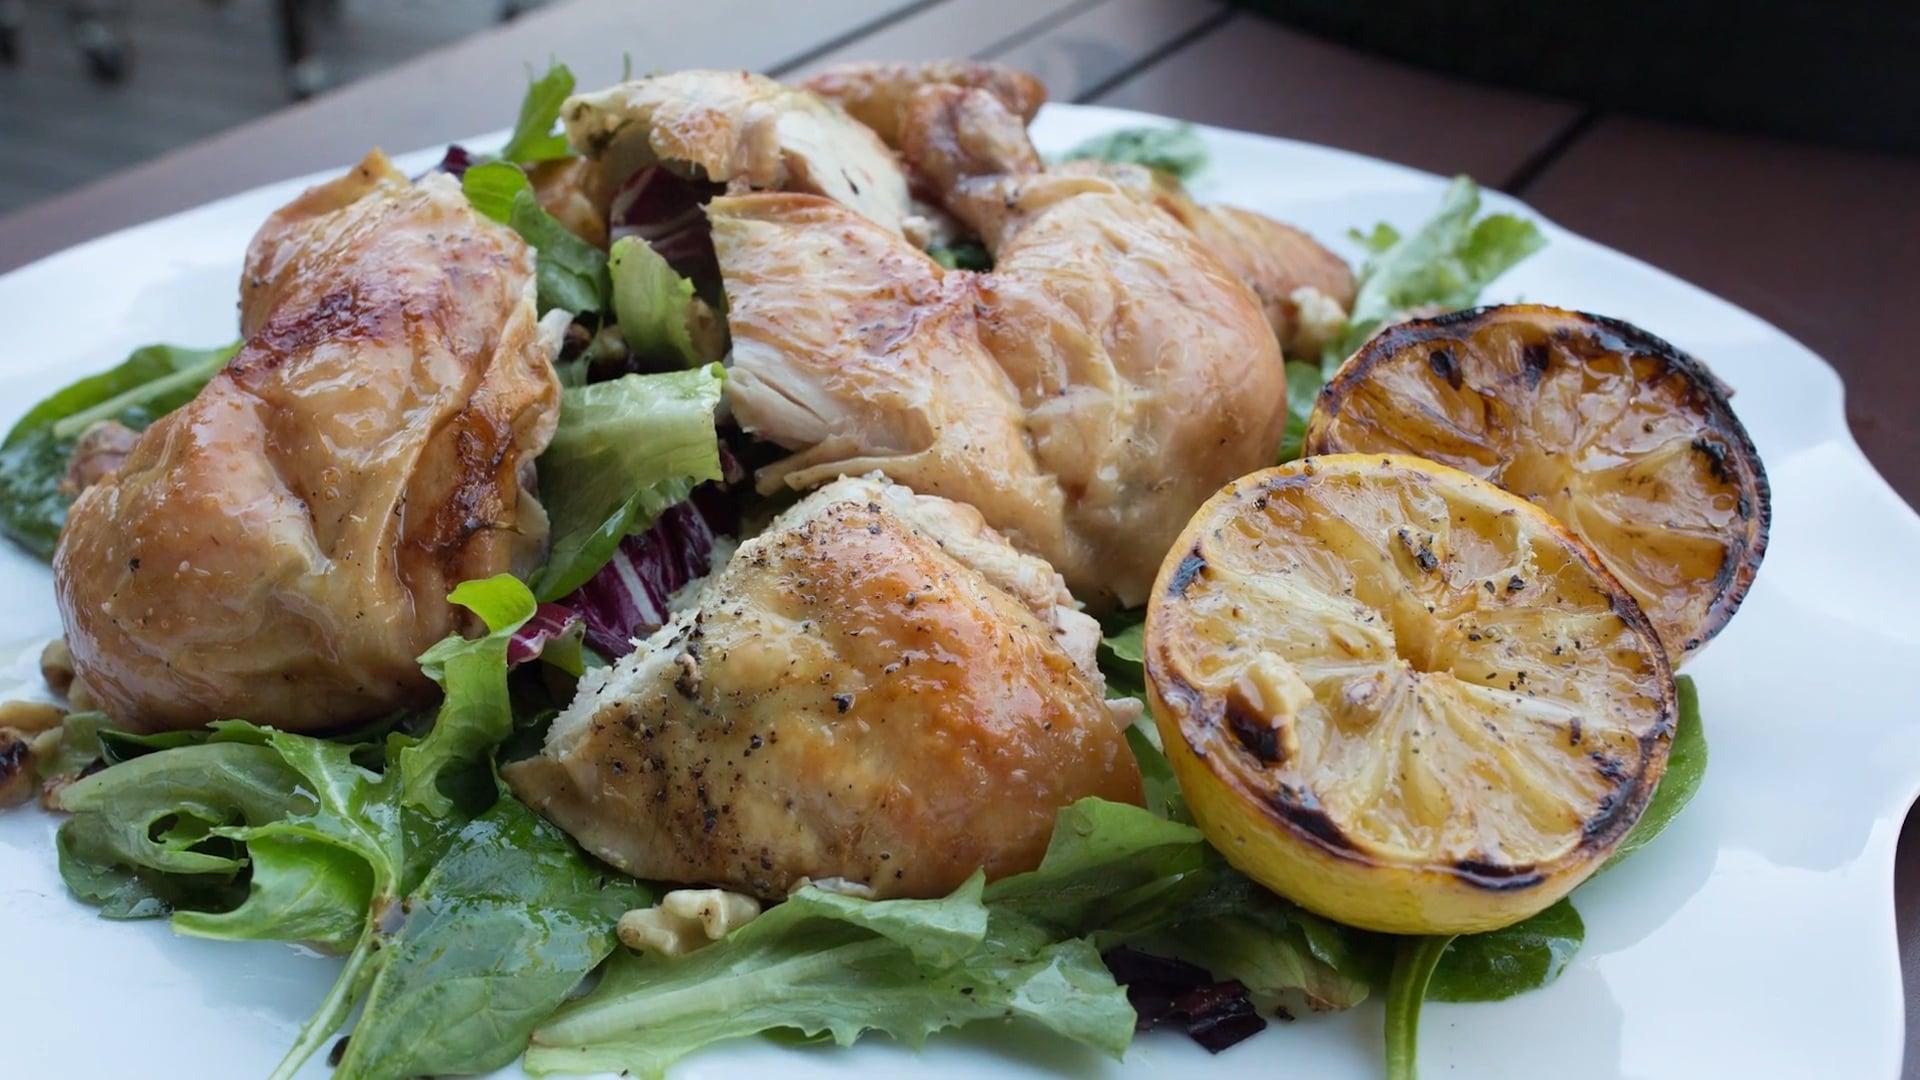 Rusty Bowers - Roasted Chicken (Lemon Herb roasted Chicken) Teaser